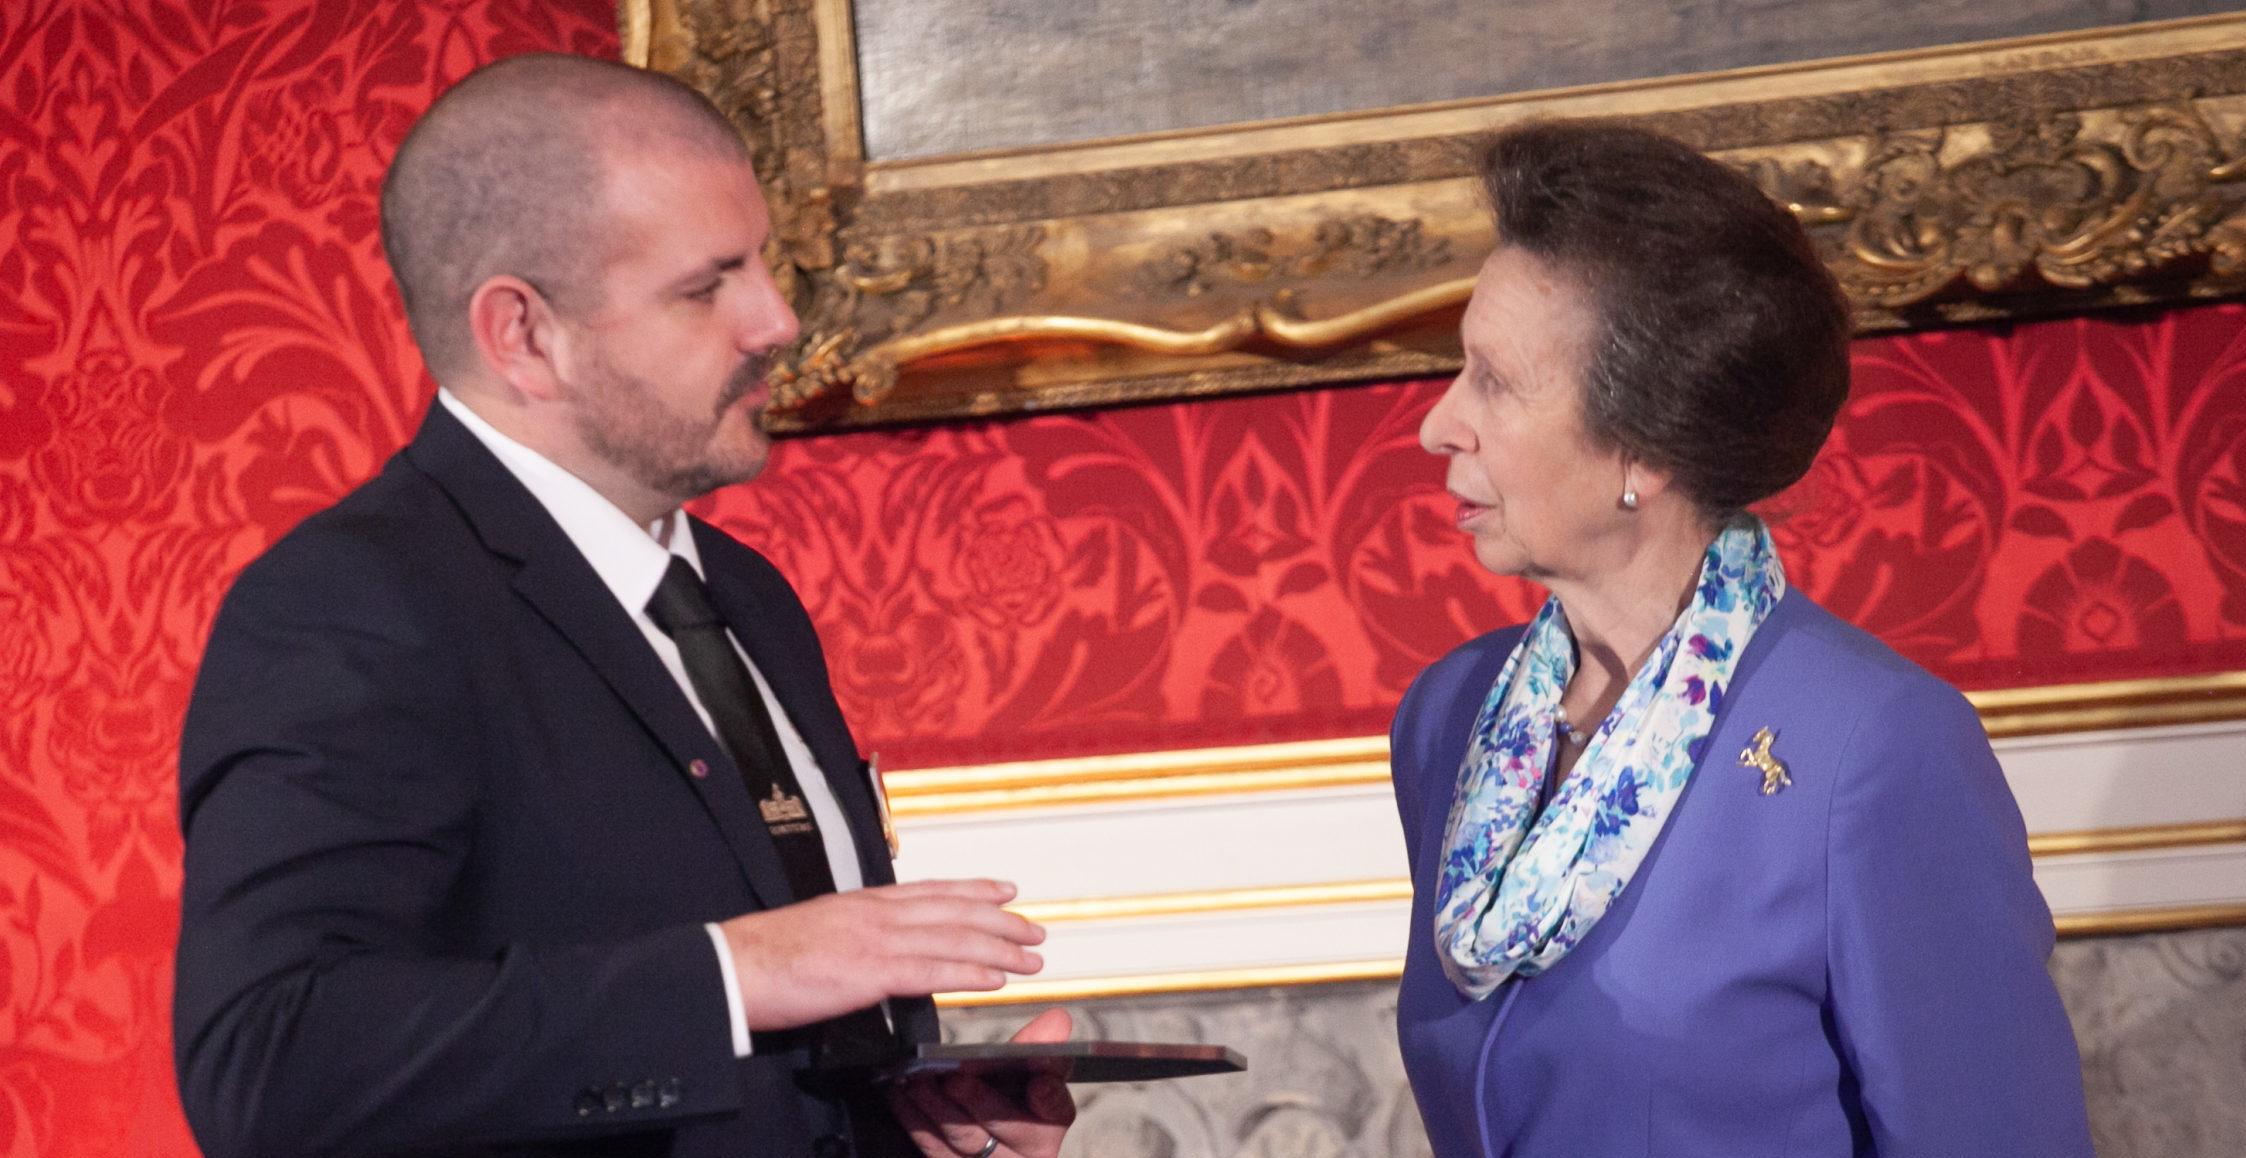 2018 Princess Royal Training Awards